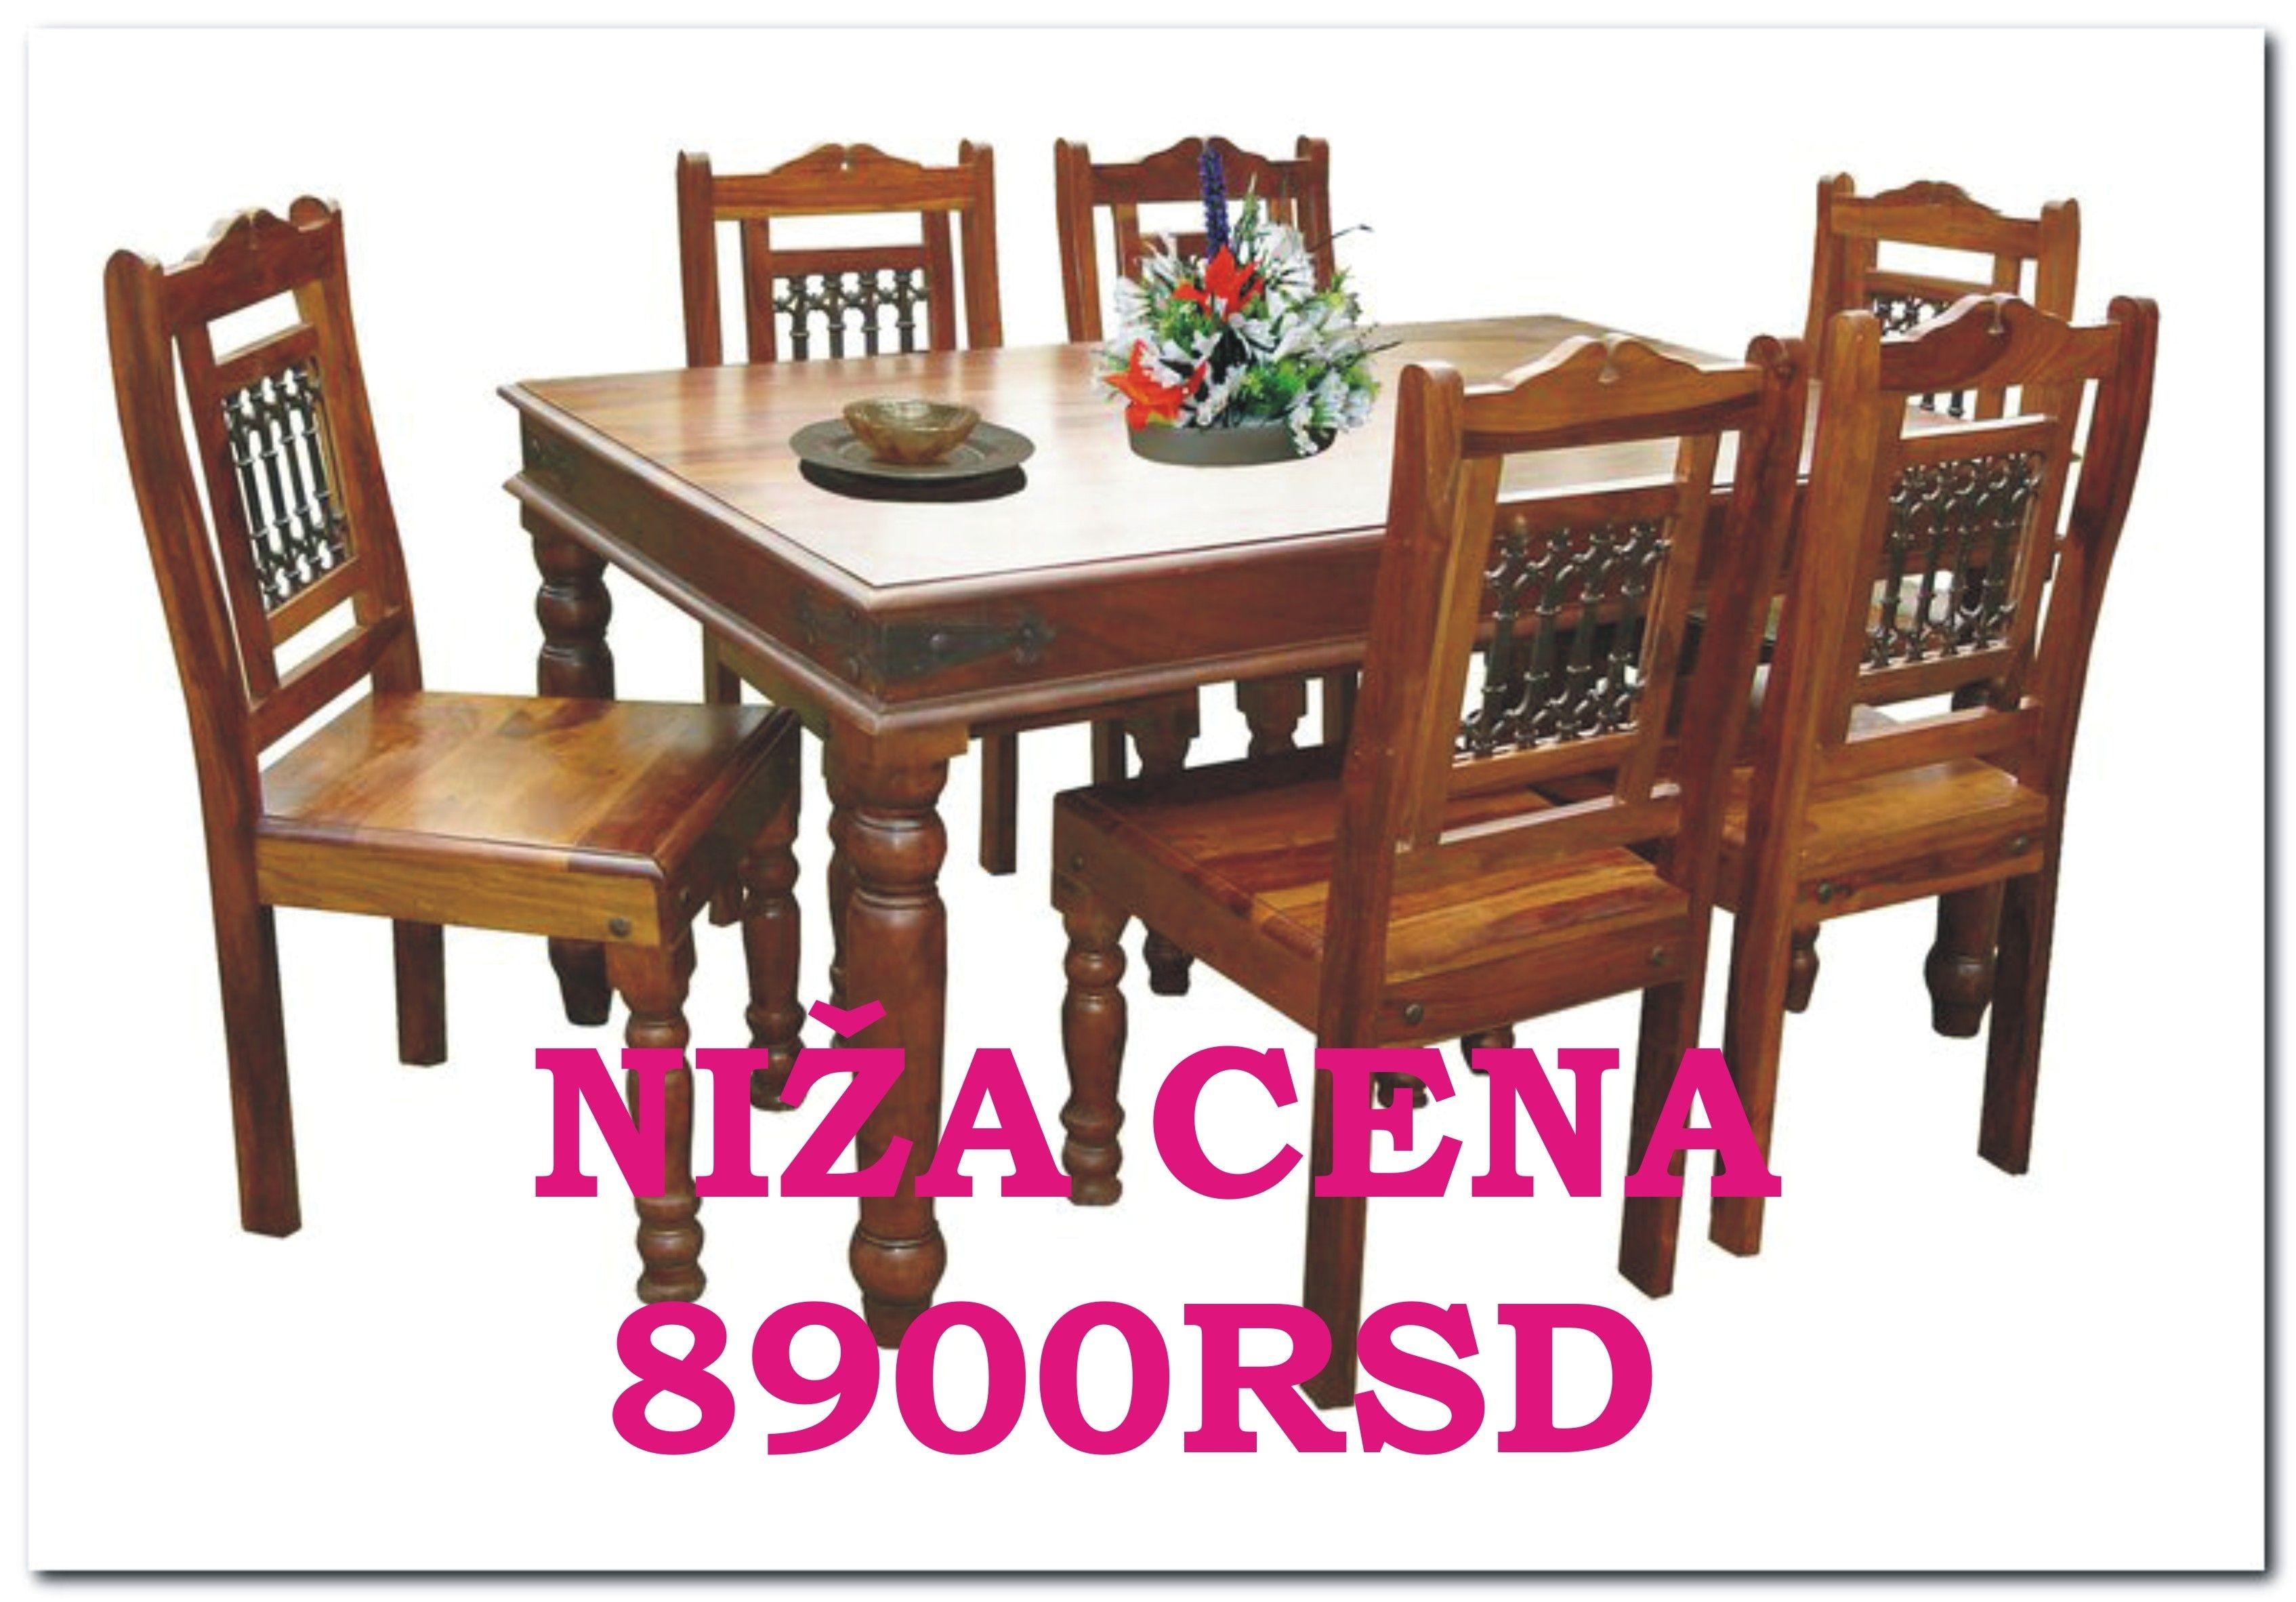 "antique dining room furniture 1920 beautiful stolica od punog drveta u kombinaciji sa kovanim gvoa…a¾a"""